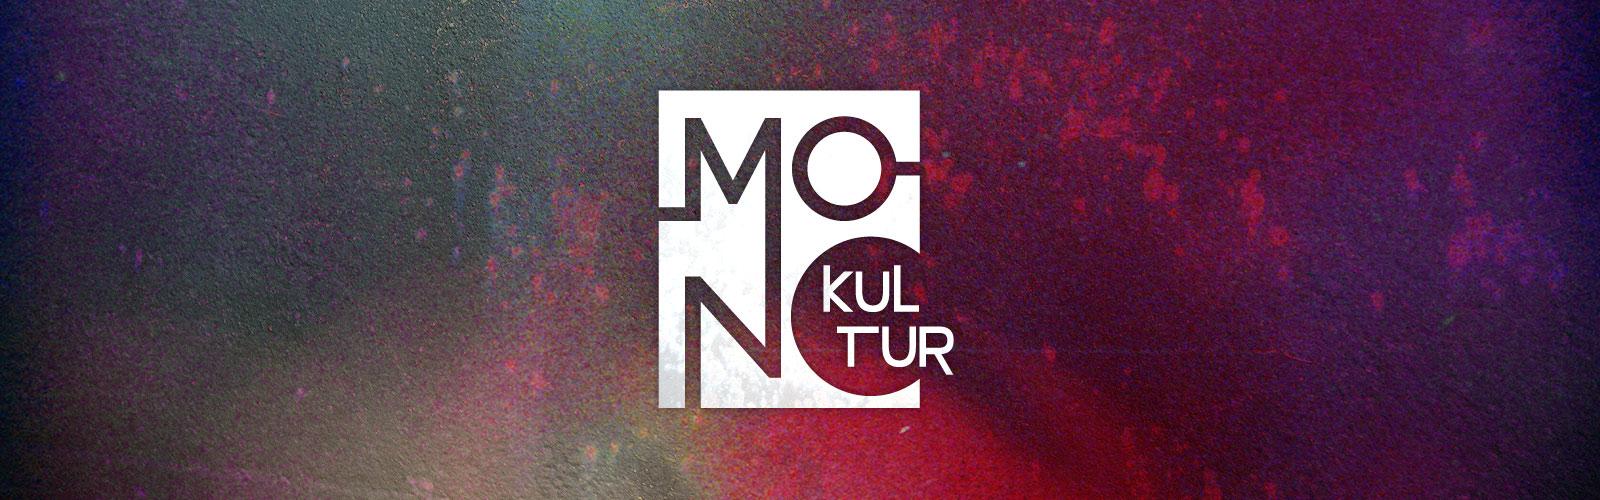 MonoKultur – LORELAY & LAURA GUIDI